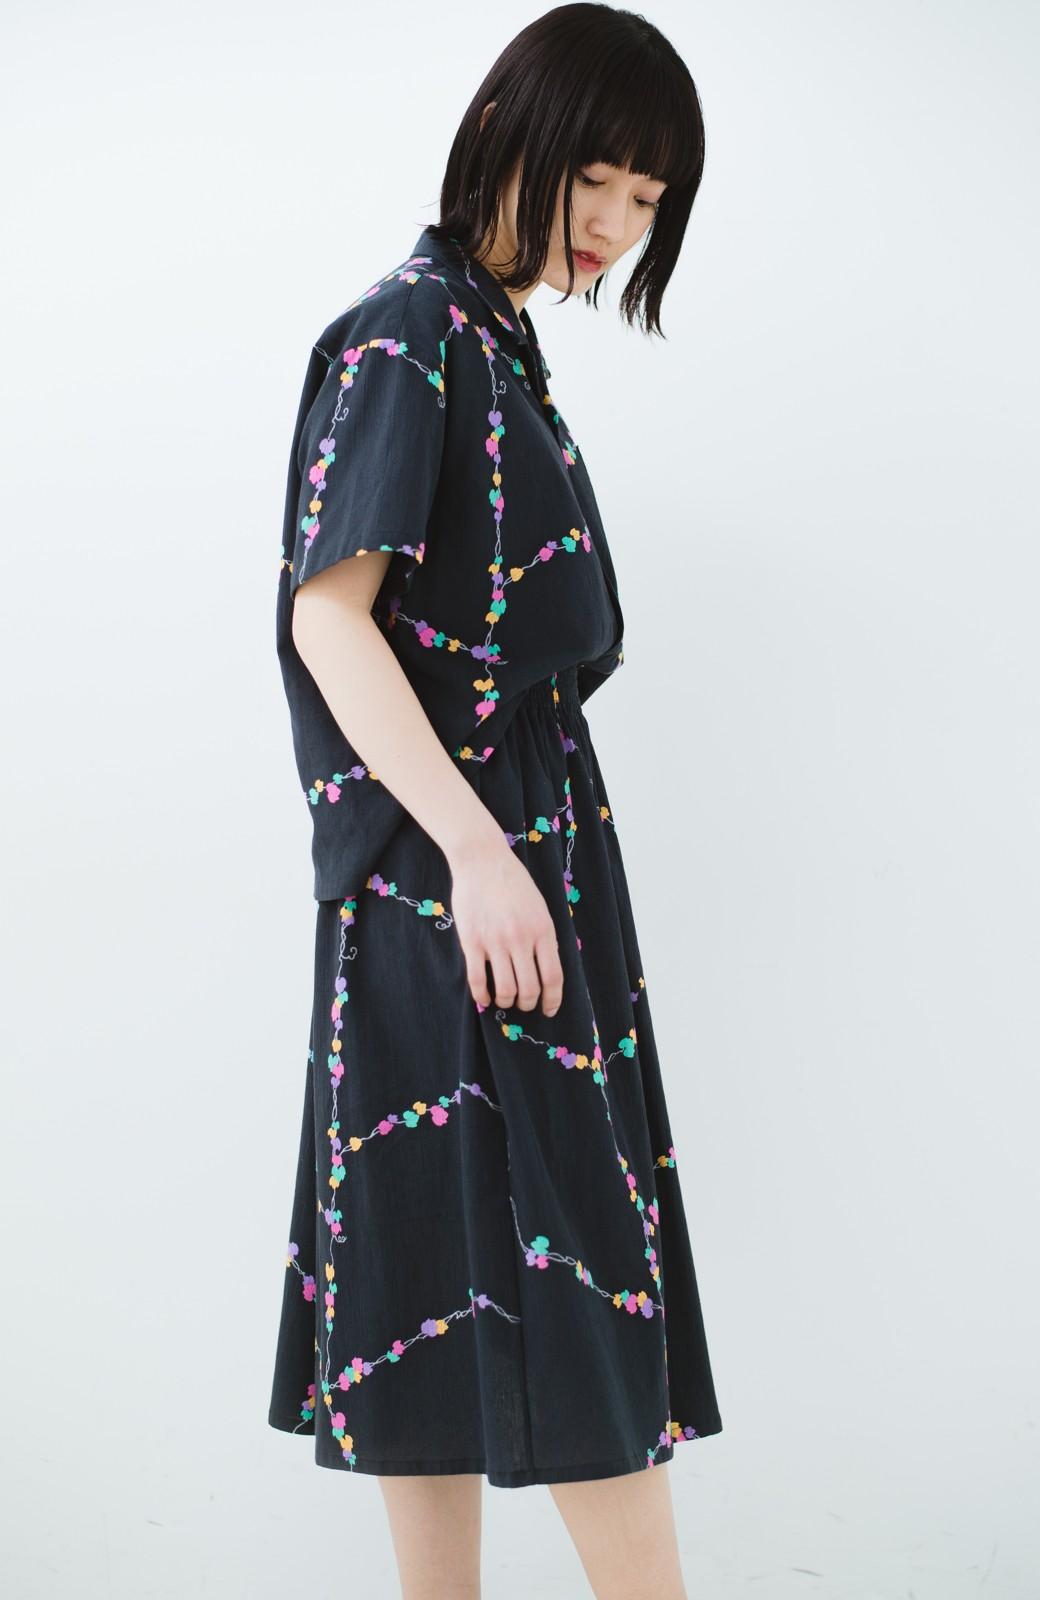 haco! 京都の浴衣屋さんと作った浴衣生地のスカート <ブラック系その他>の商品写真21